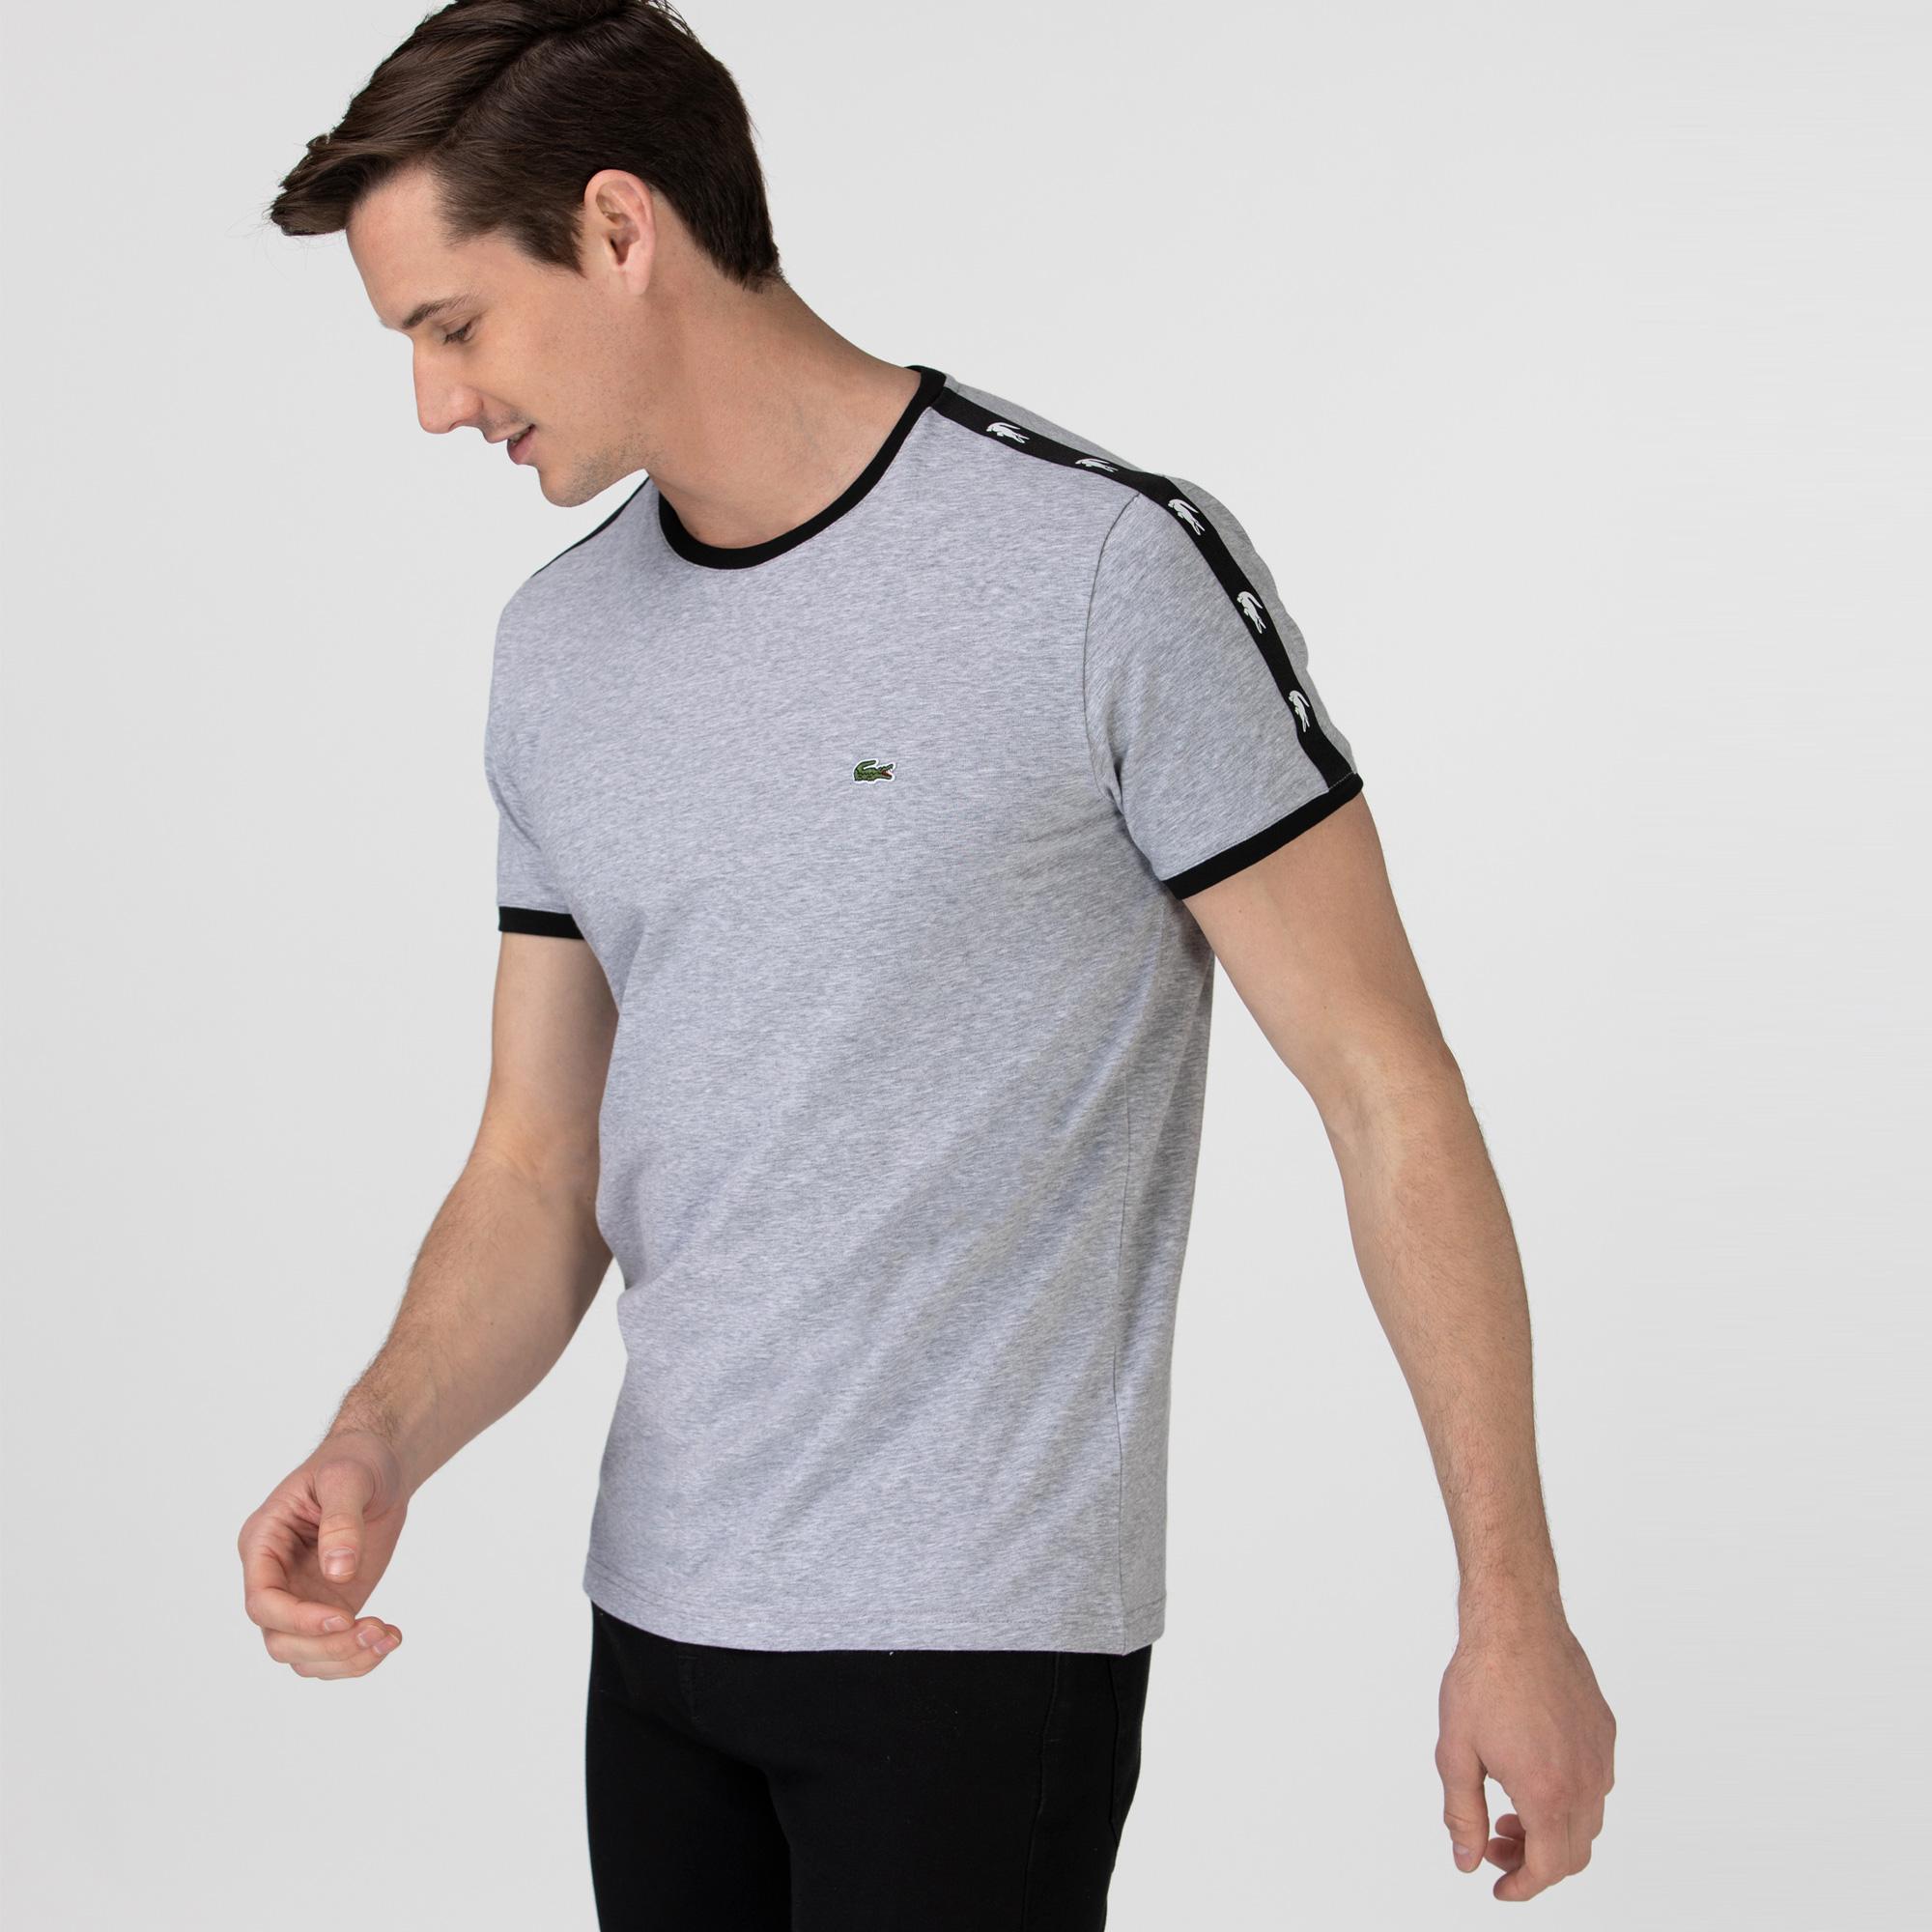 Lacoste Erkek Bisiklet Yaka Baskılı Gri T-Shirt